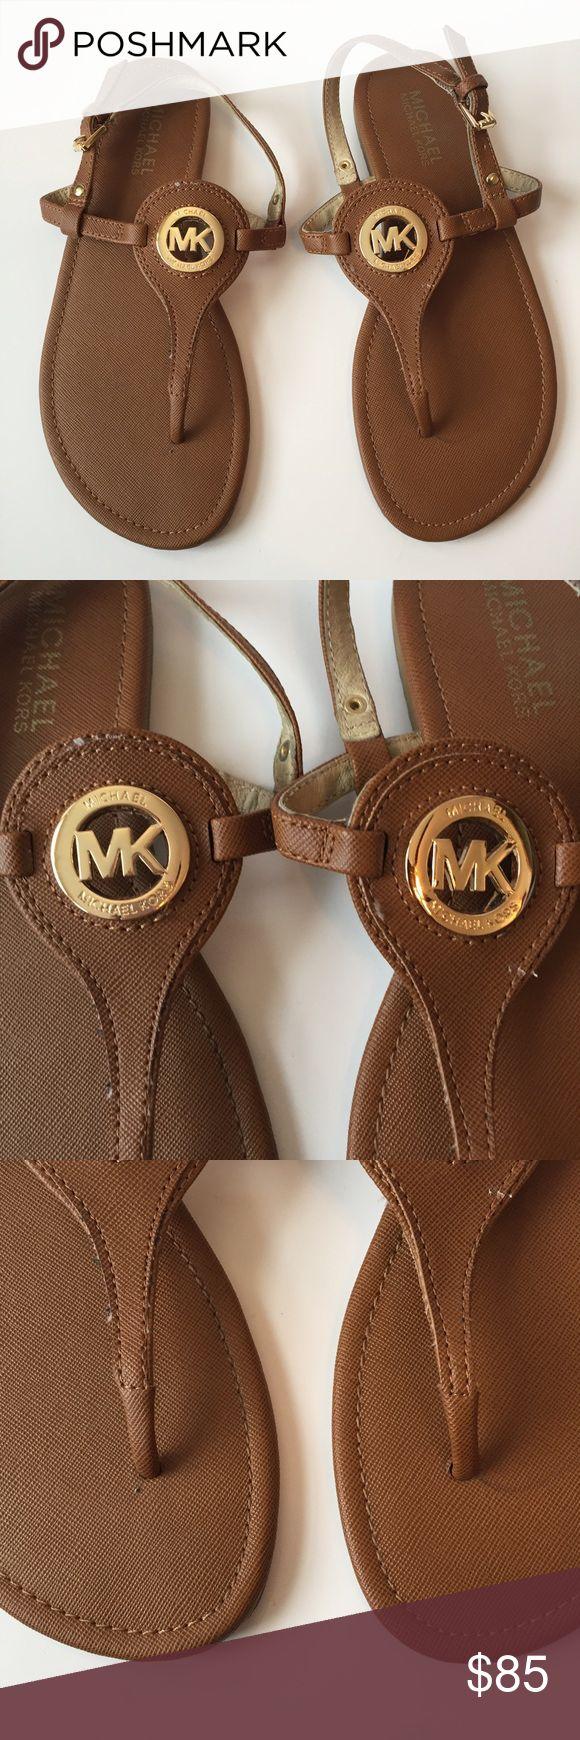 Black mk sandals -  Michael Kors Tan Sandals